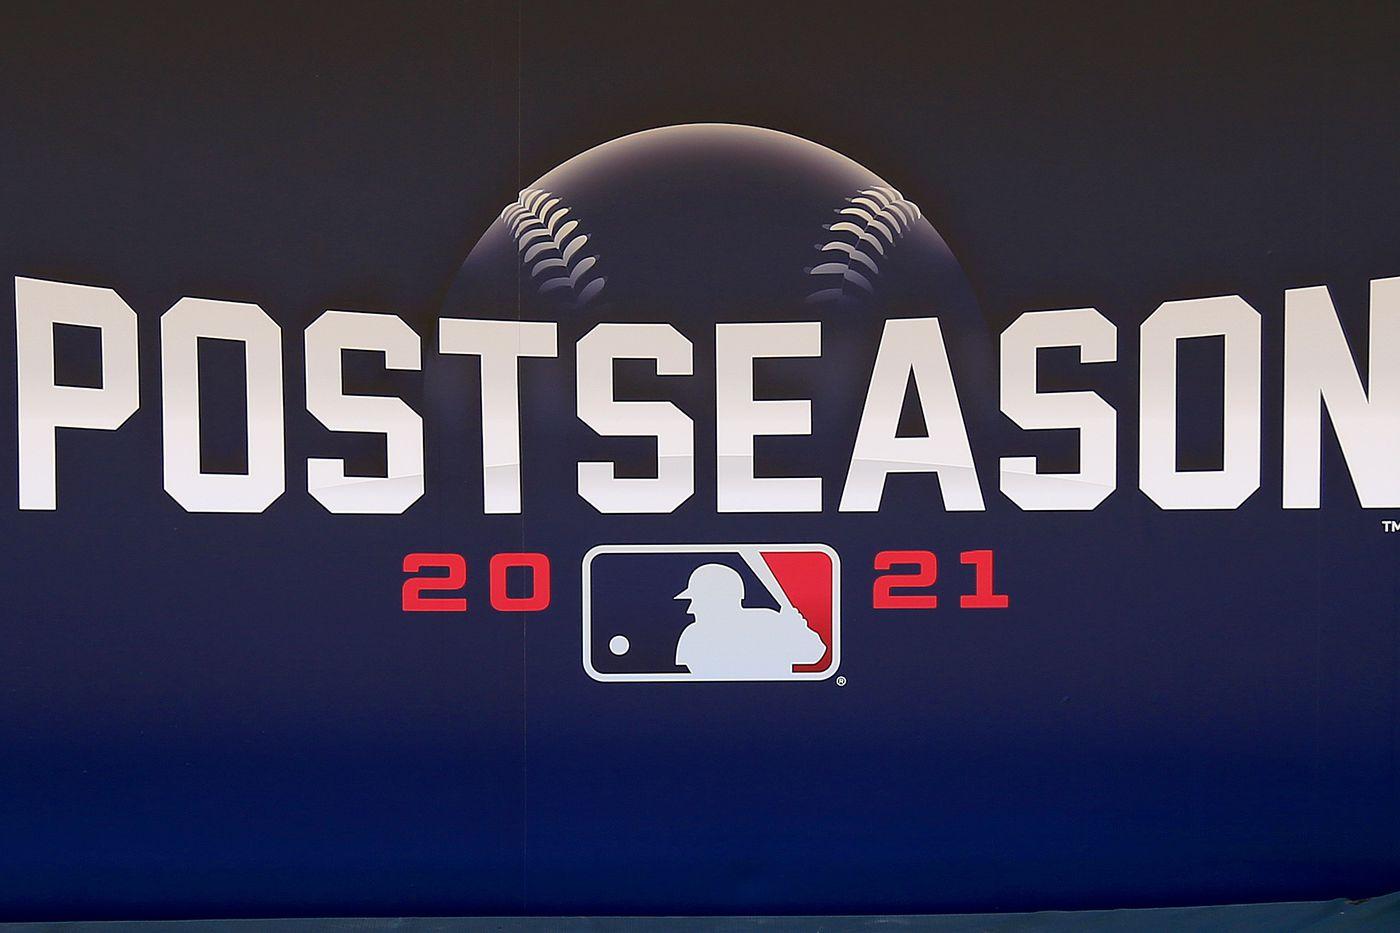 MLB 2021 Postseason GameThreads: Game 4 Tuesday - Federal Baseball